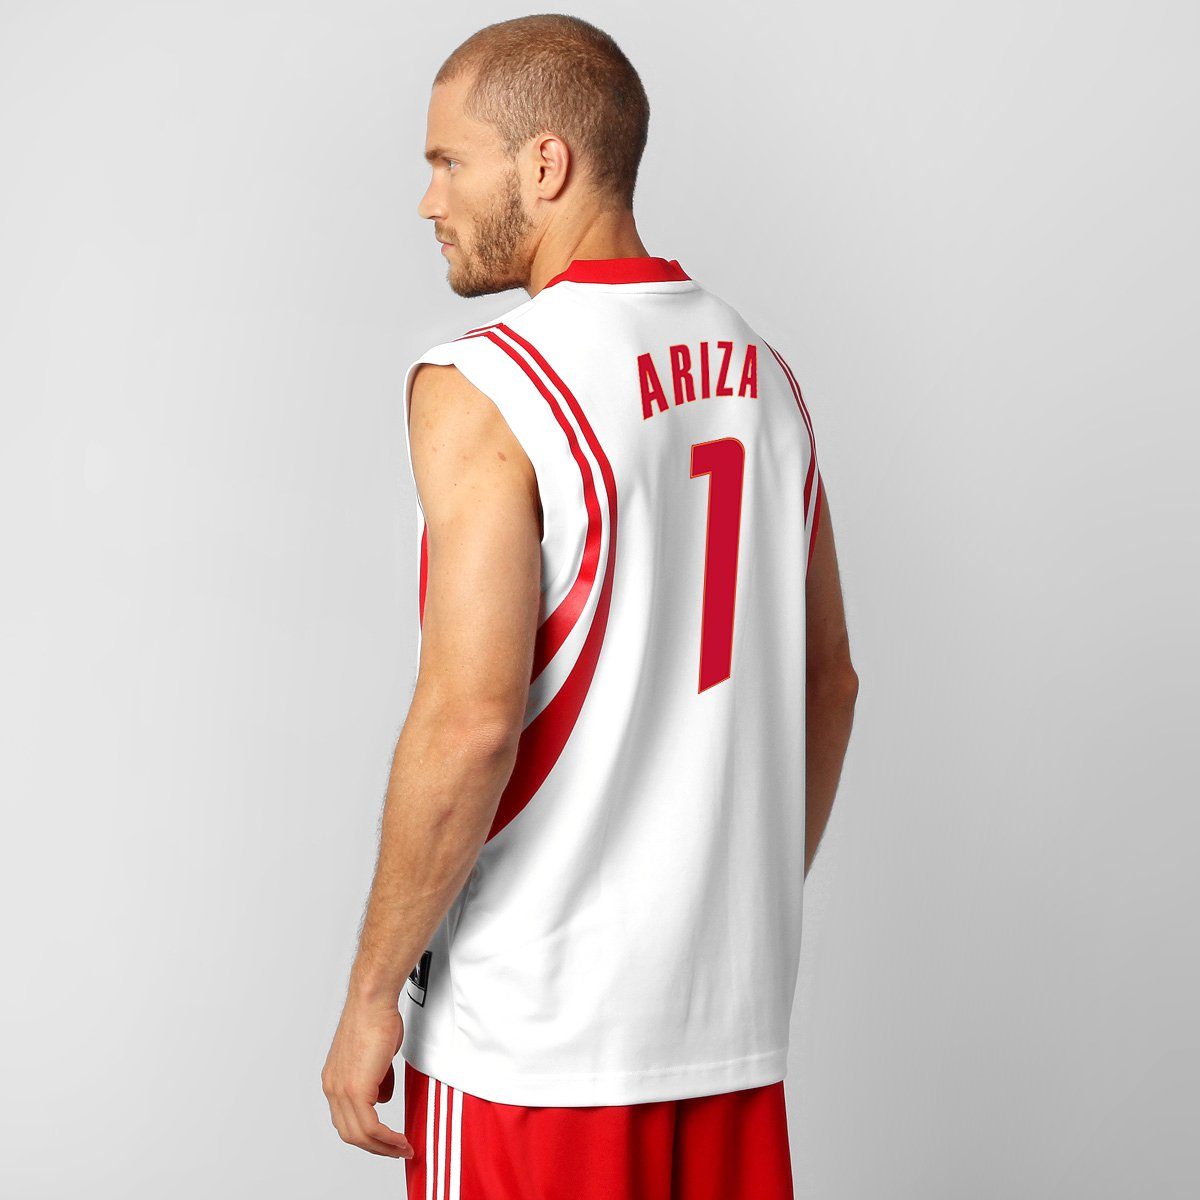 68dd148651e07 Camiseta Regata Adidas Houston Rockets Home - Ariza n° 1 - Compre Agora